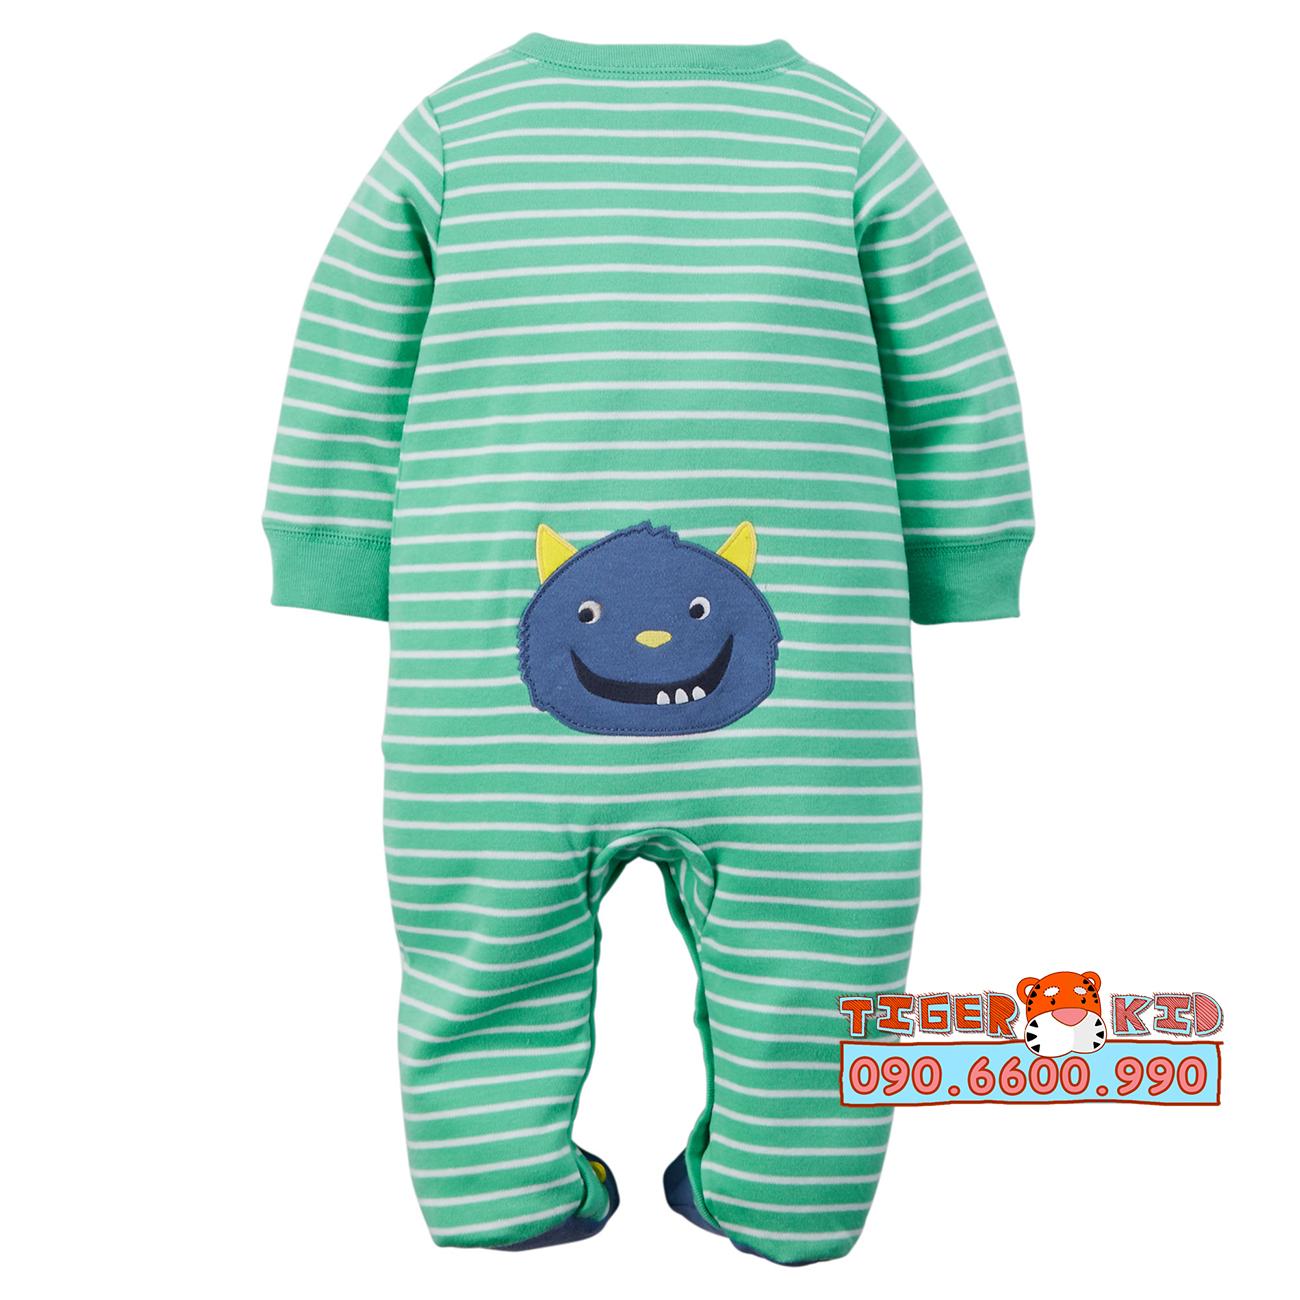 30631567990 bc094f5a85 o Sleepsuit nhập Mỹ size 6M;9M